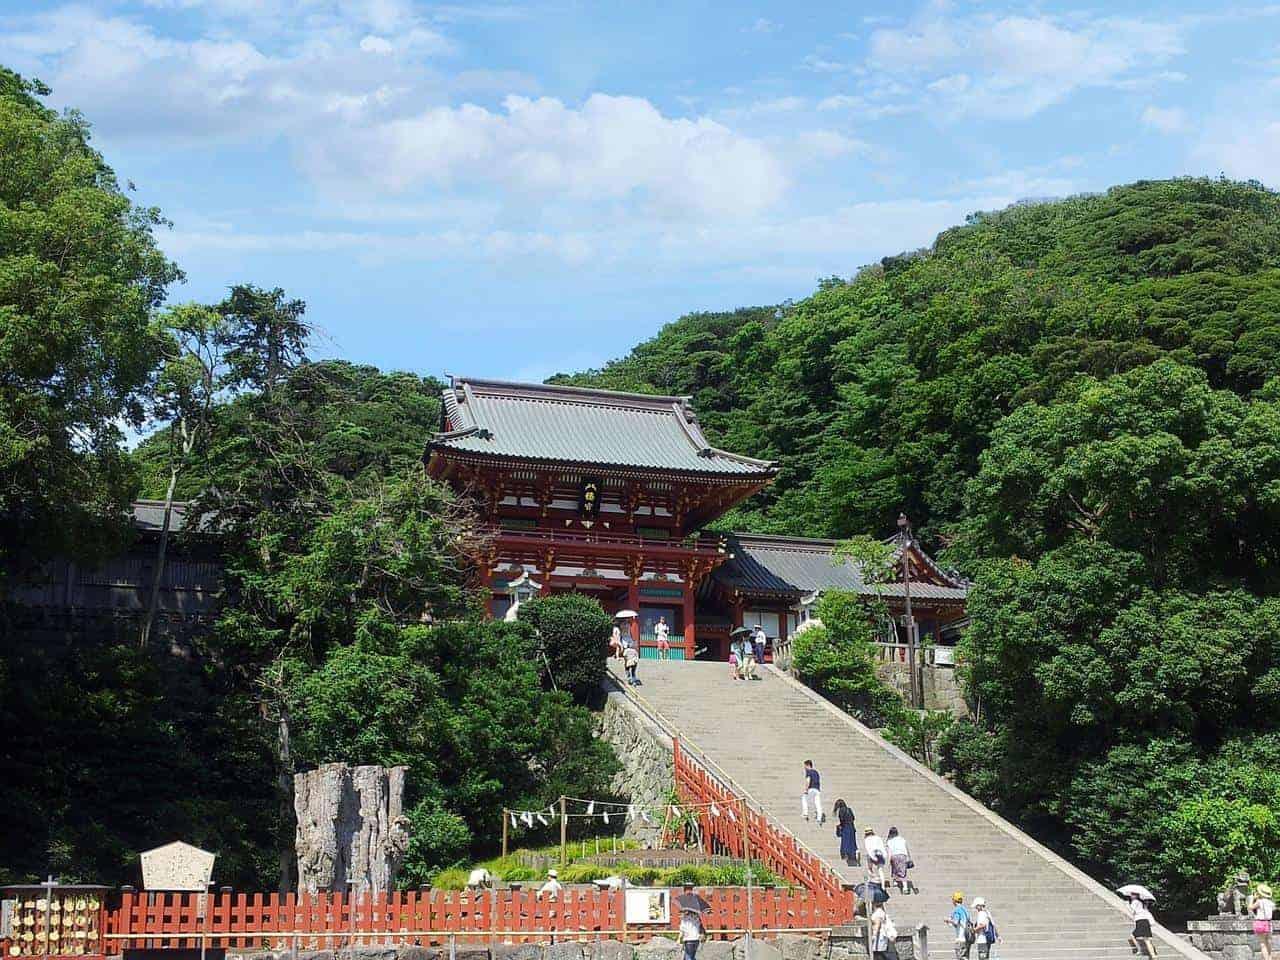 kamakura_essential_tsurugaoka-hachimangu-shrine-476135_1280